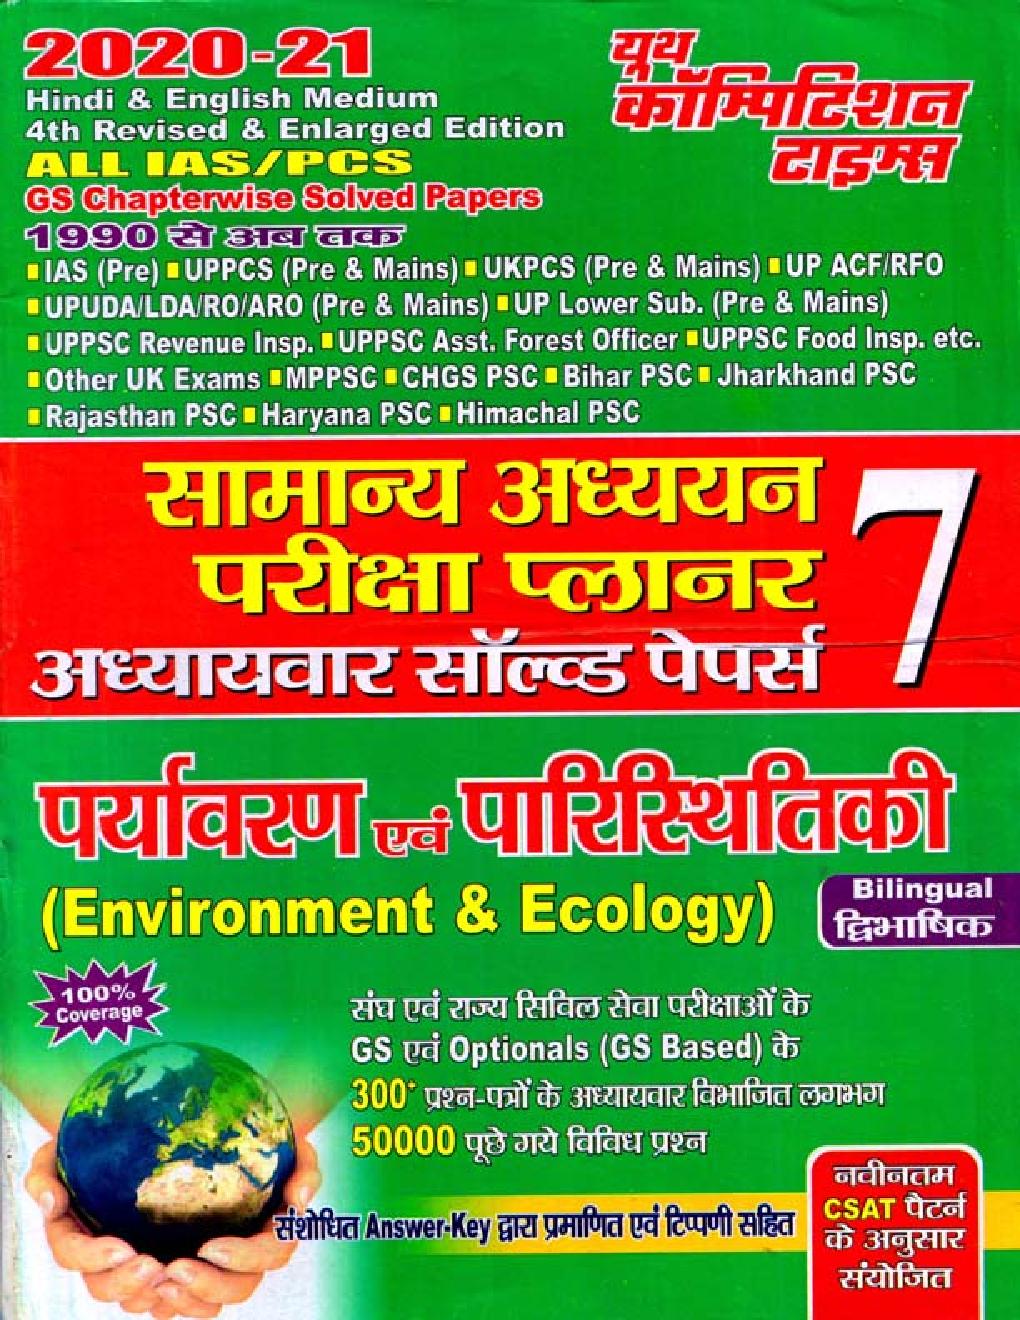 सामान्य अध्ययन (पर्यावरण एवं पारिस्थितिकी) परीक्षा प्लानर - 7 (2020-21) - Page 1